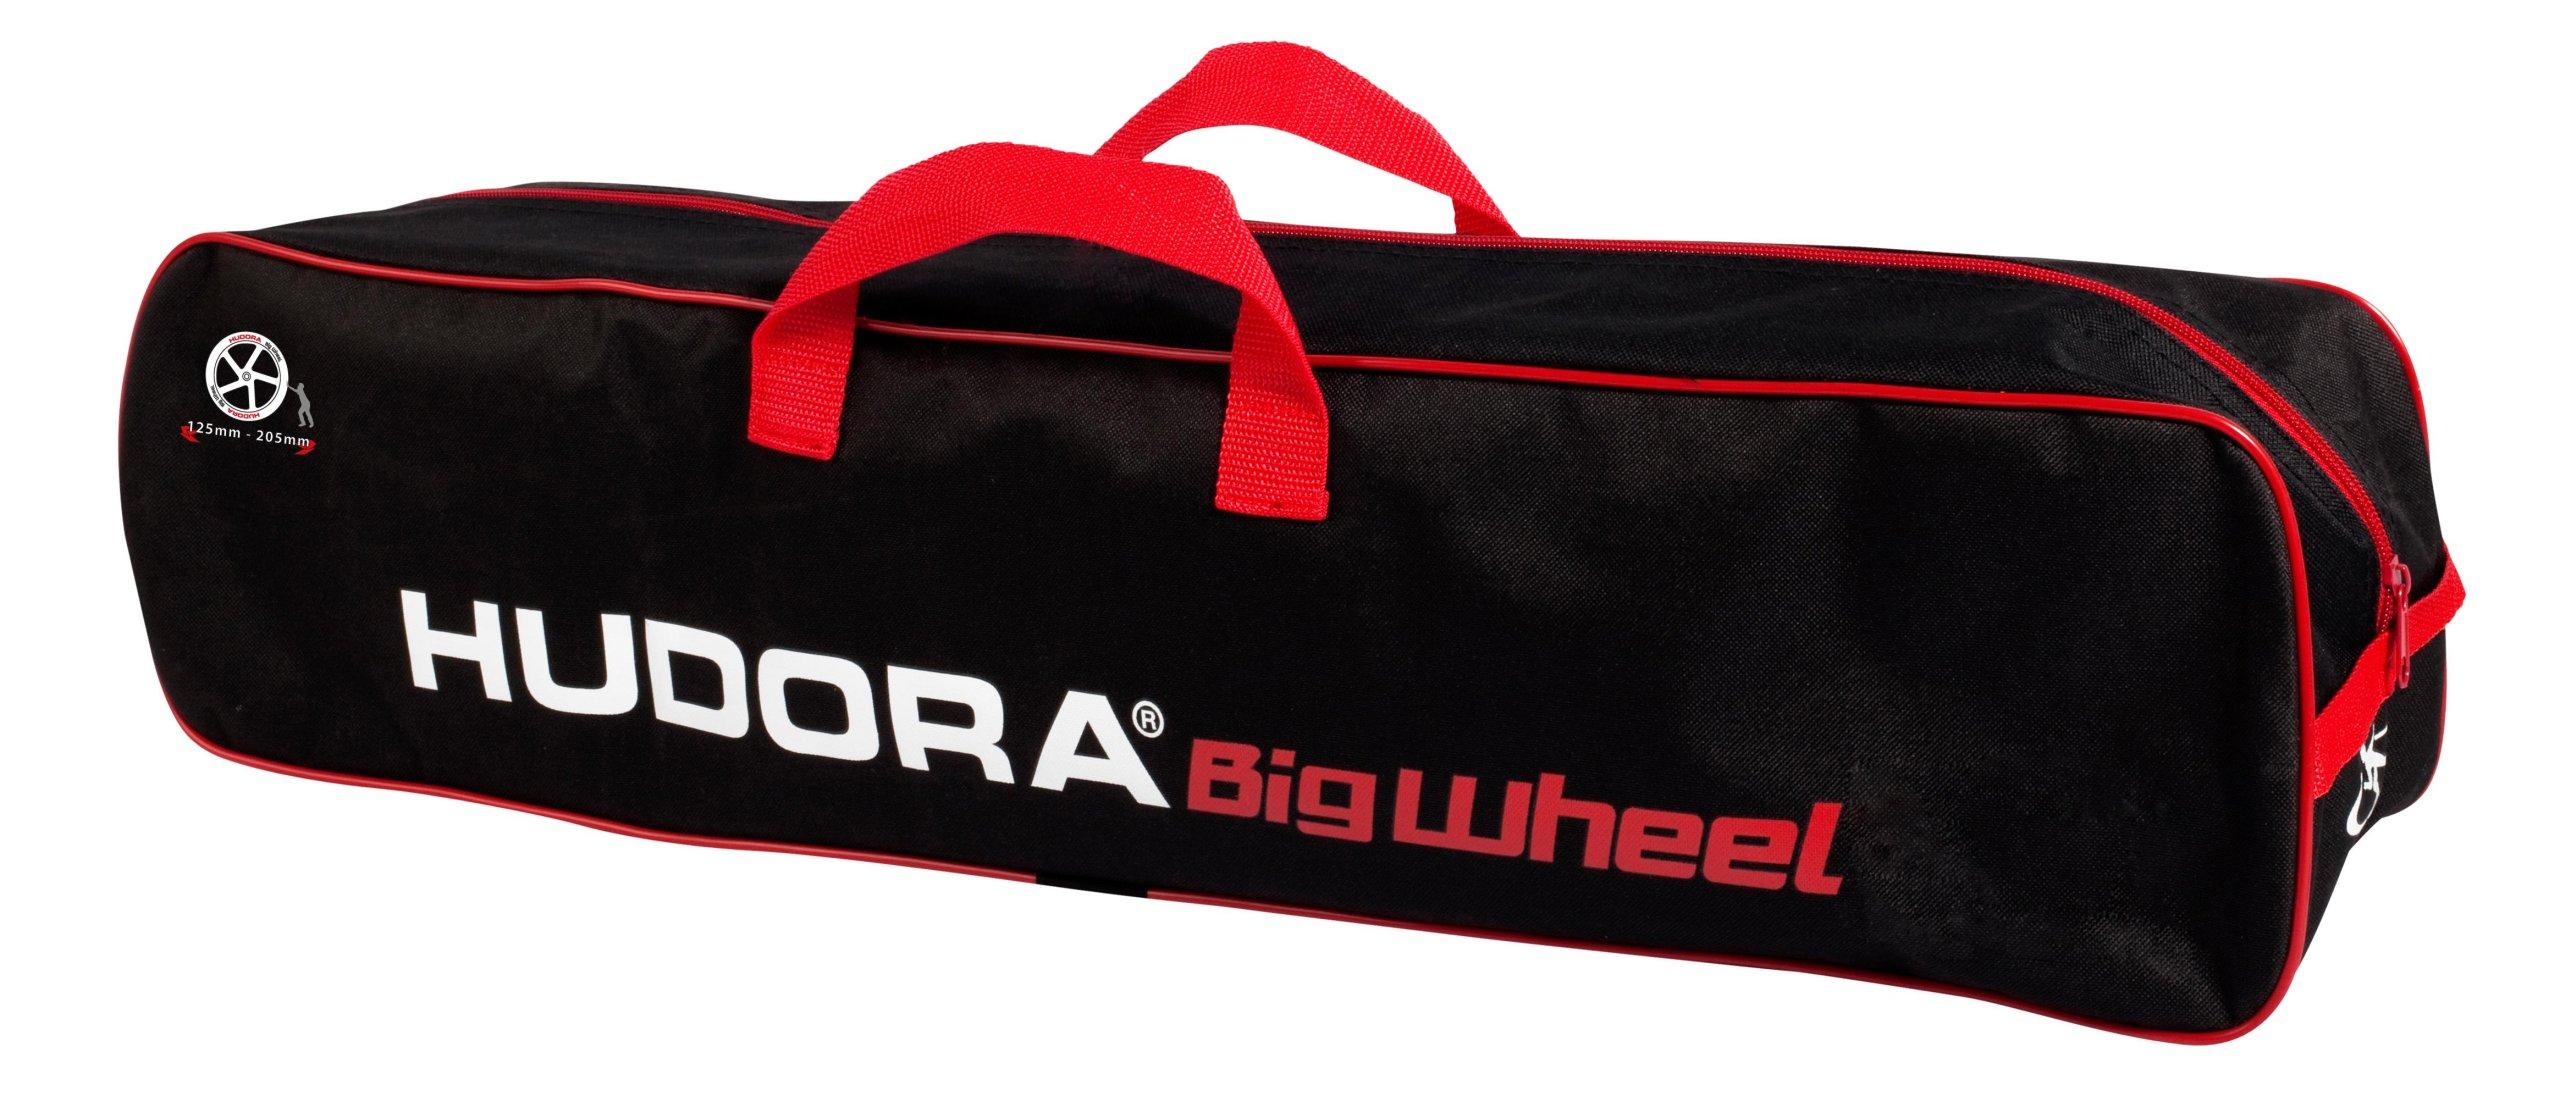 Torba pokrowiec na hulajnogę big wheel Hudora Marka Hudora